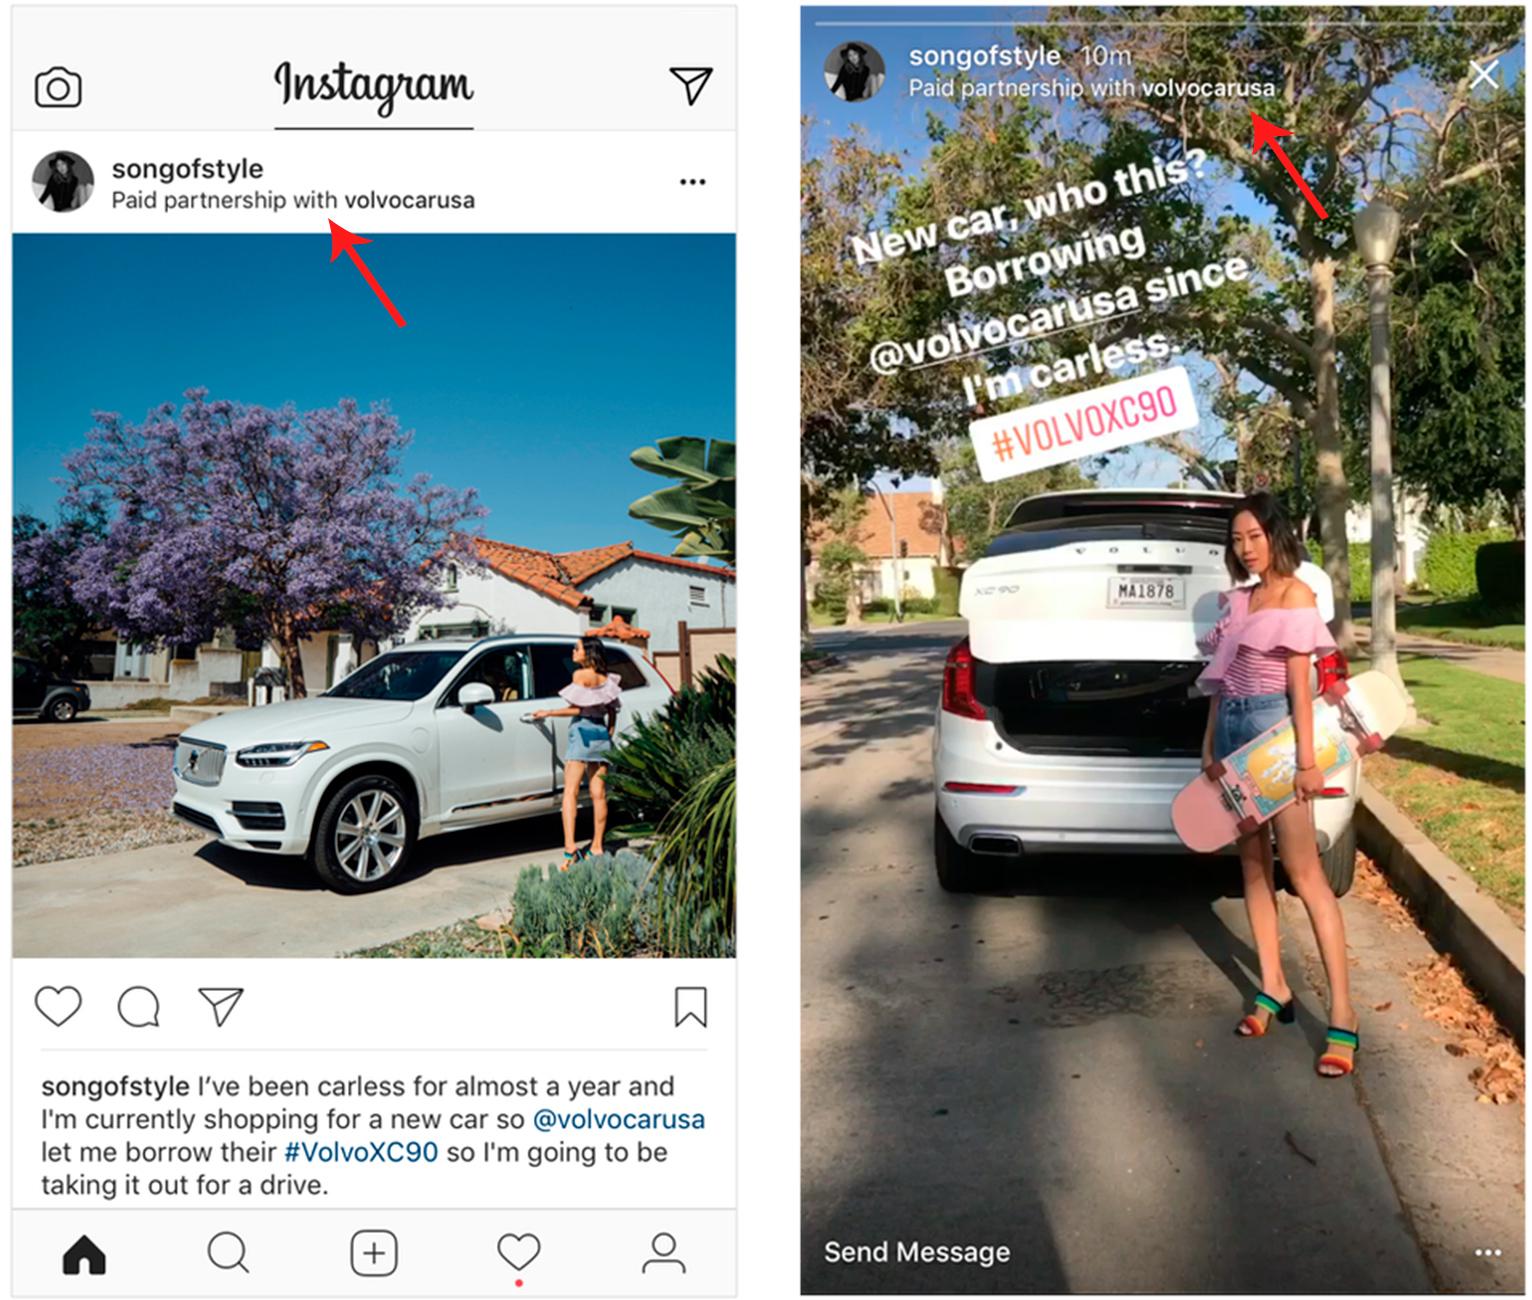 instagram-parceria-paga-postgrain